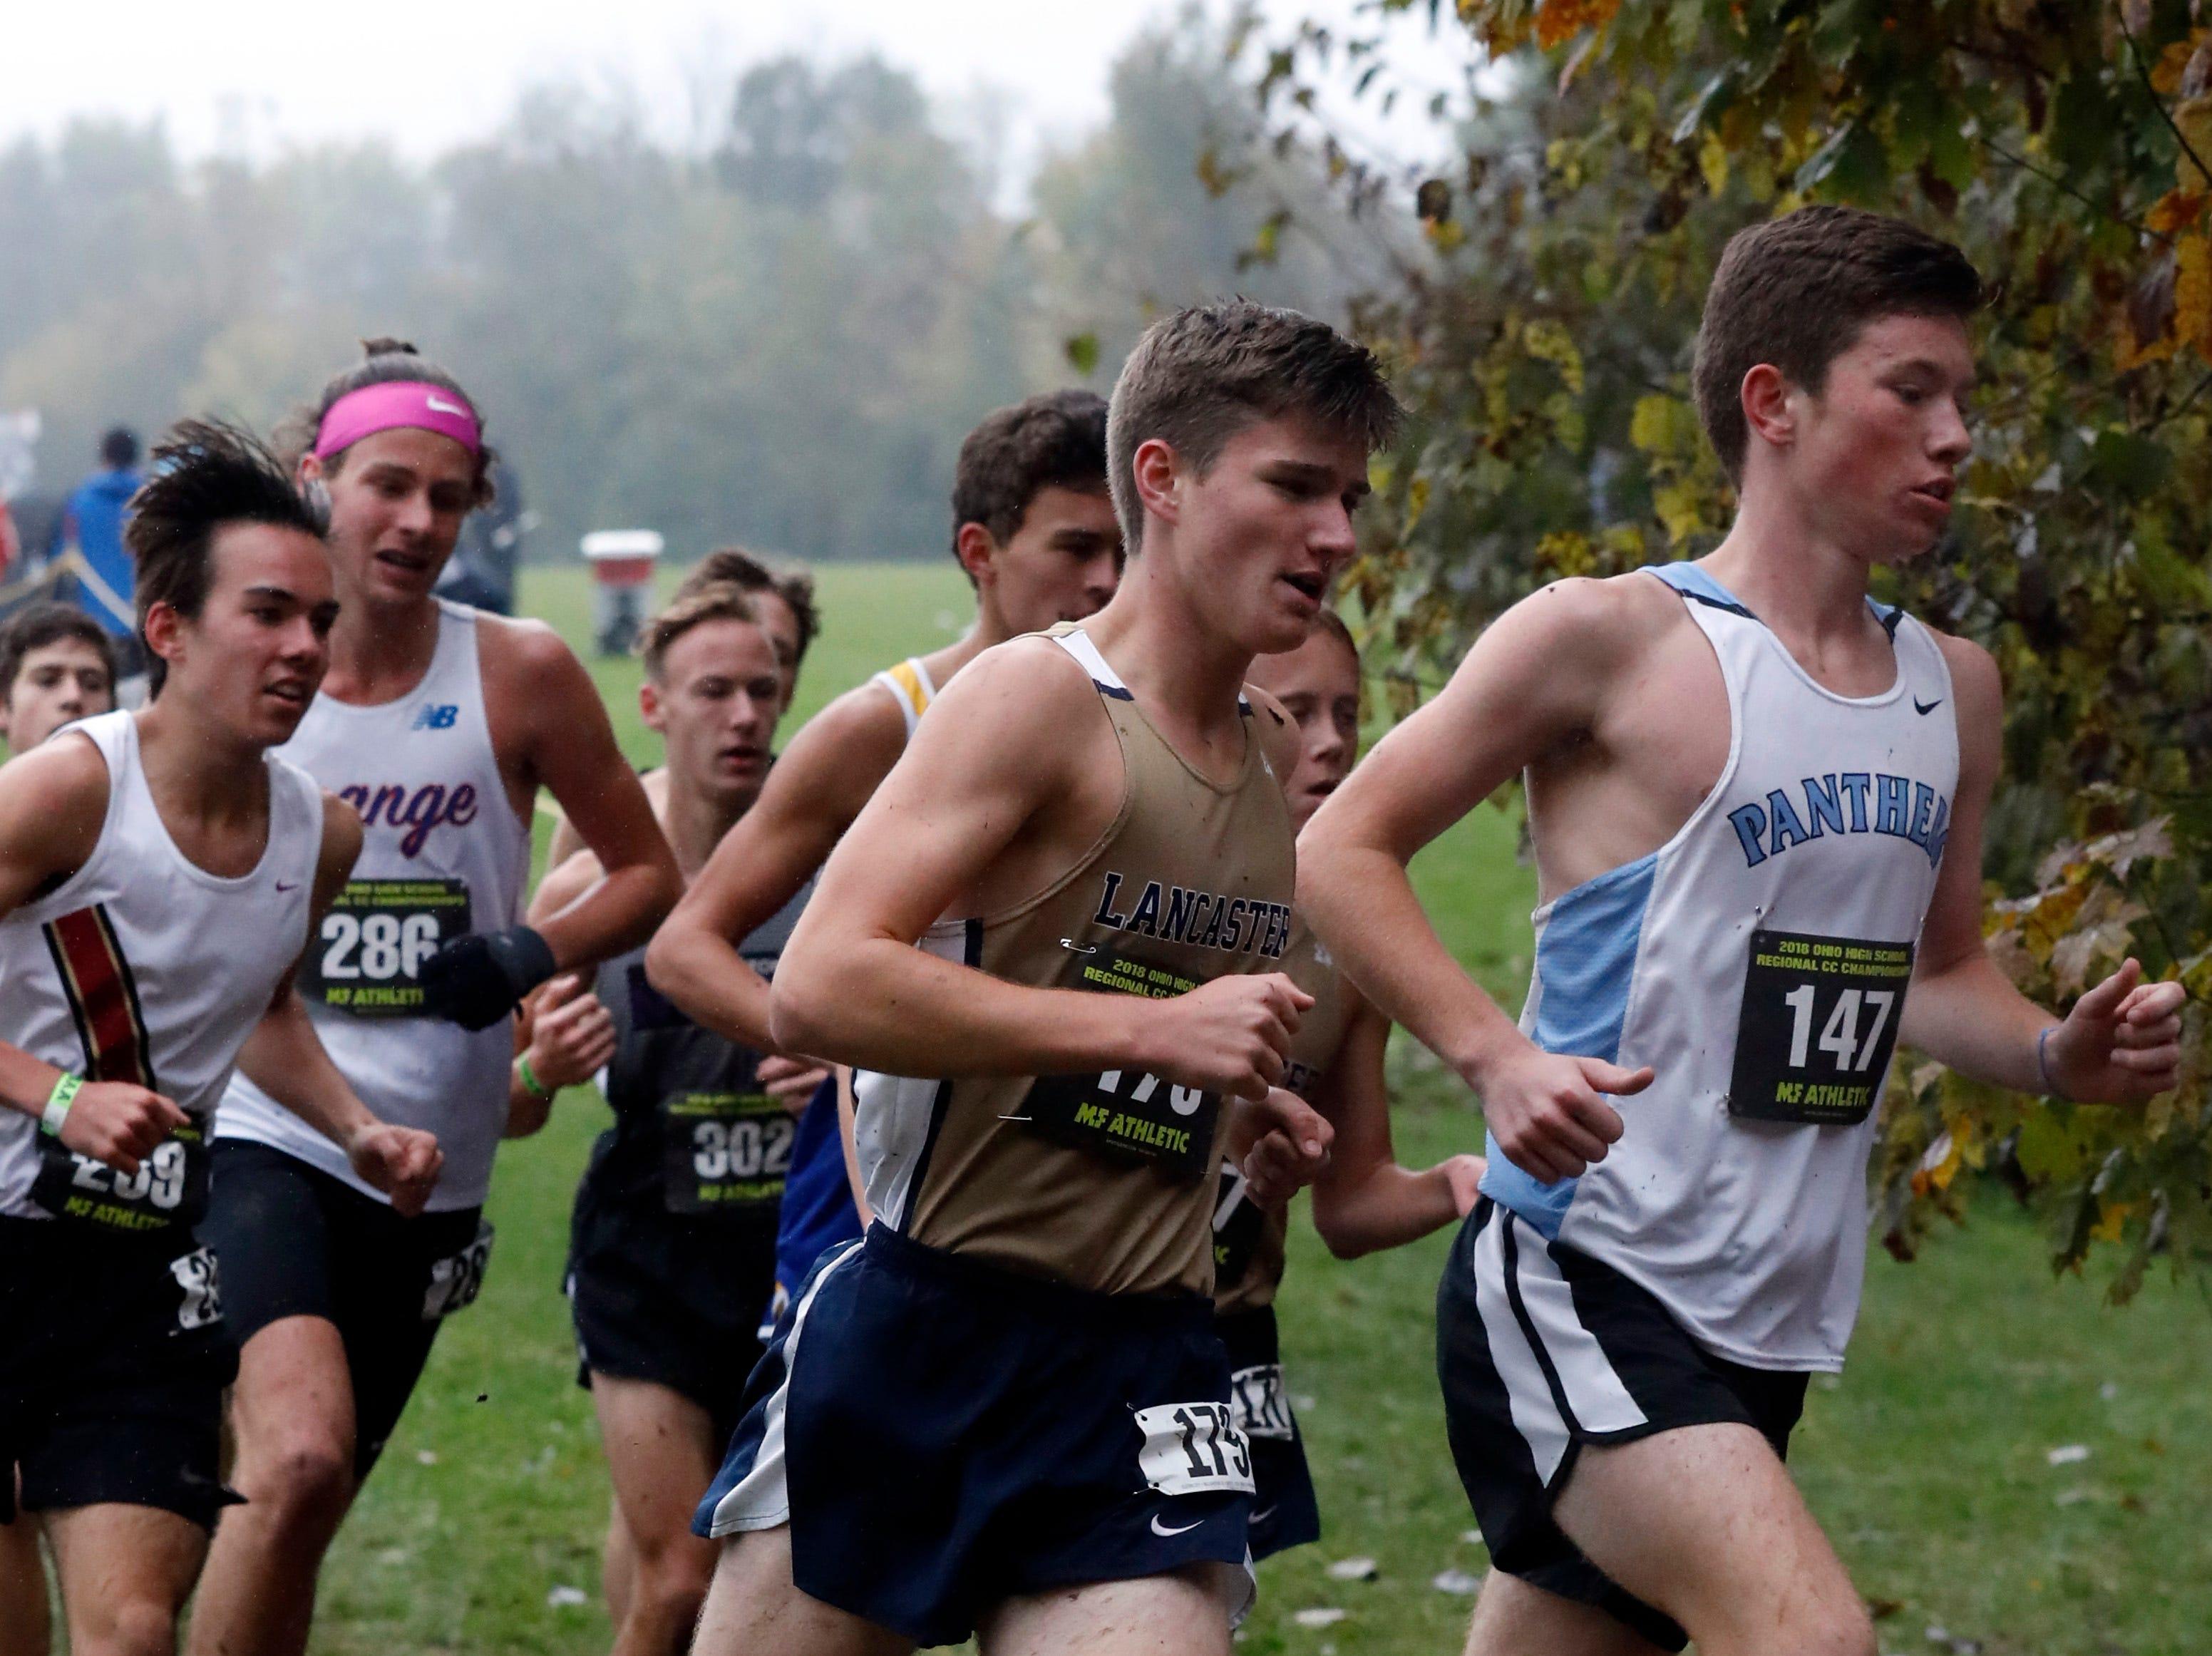 Lancaster's Andrew Smith runs in the Regional Cross Country meet Saturday, Oct. 27, 2018, at Pickerington North High School in Pickerington.